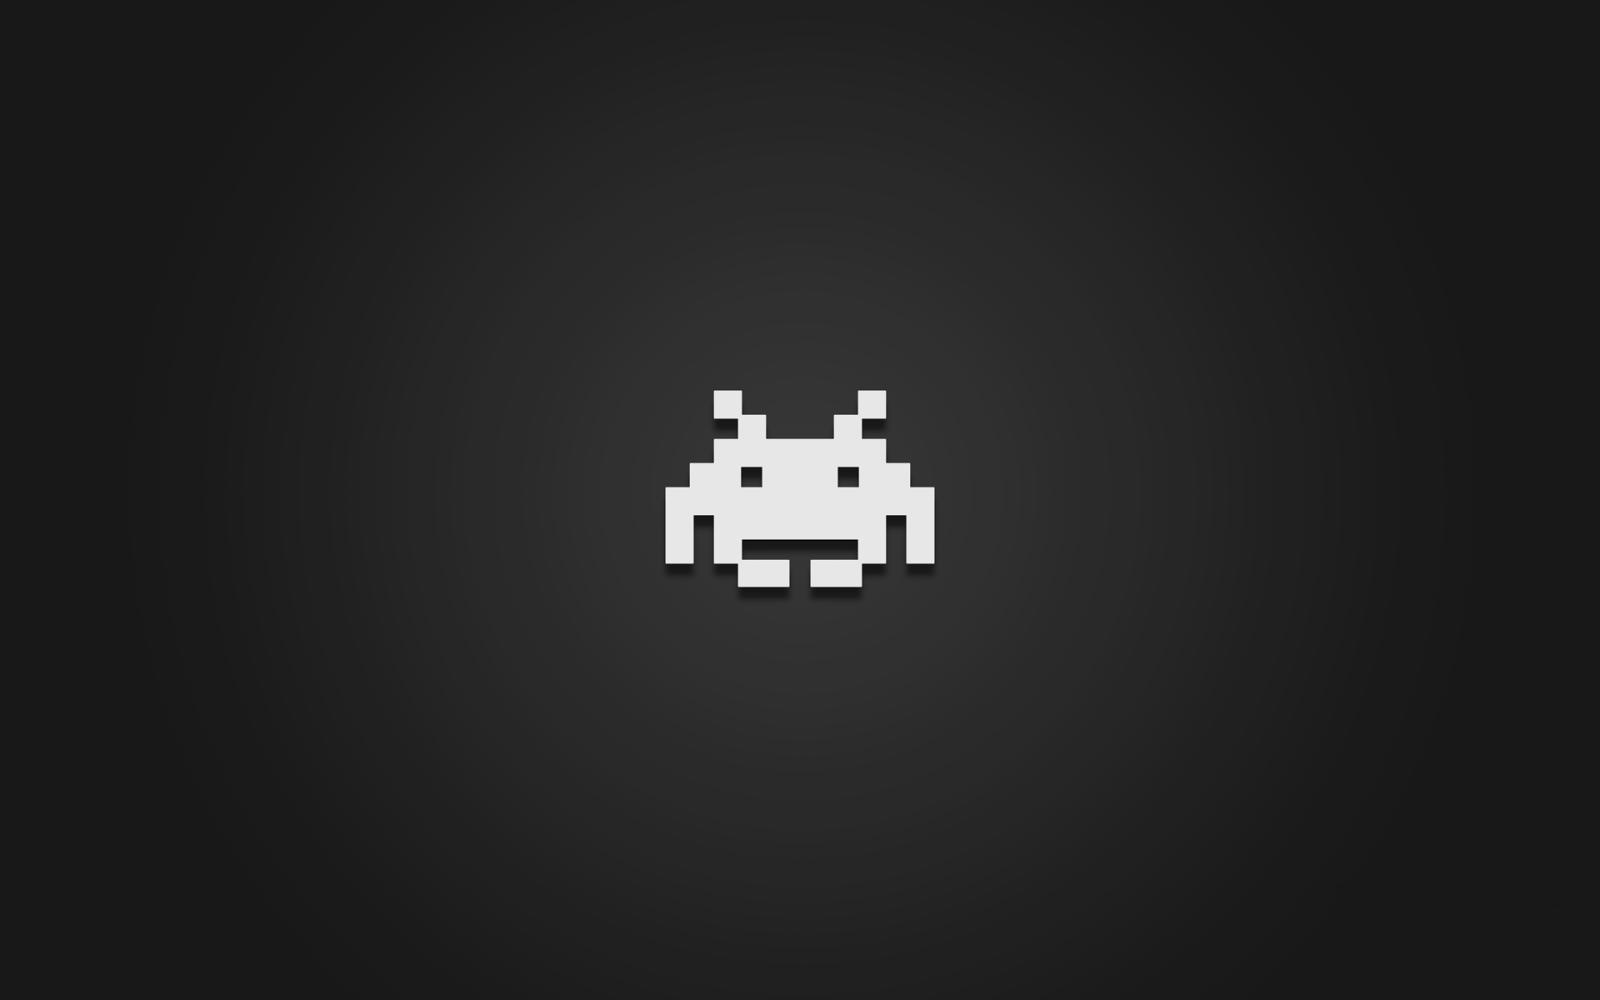 fps x gamescom20130320 retro video gaming desktop wallpapershtml 1600x1000